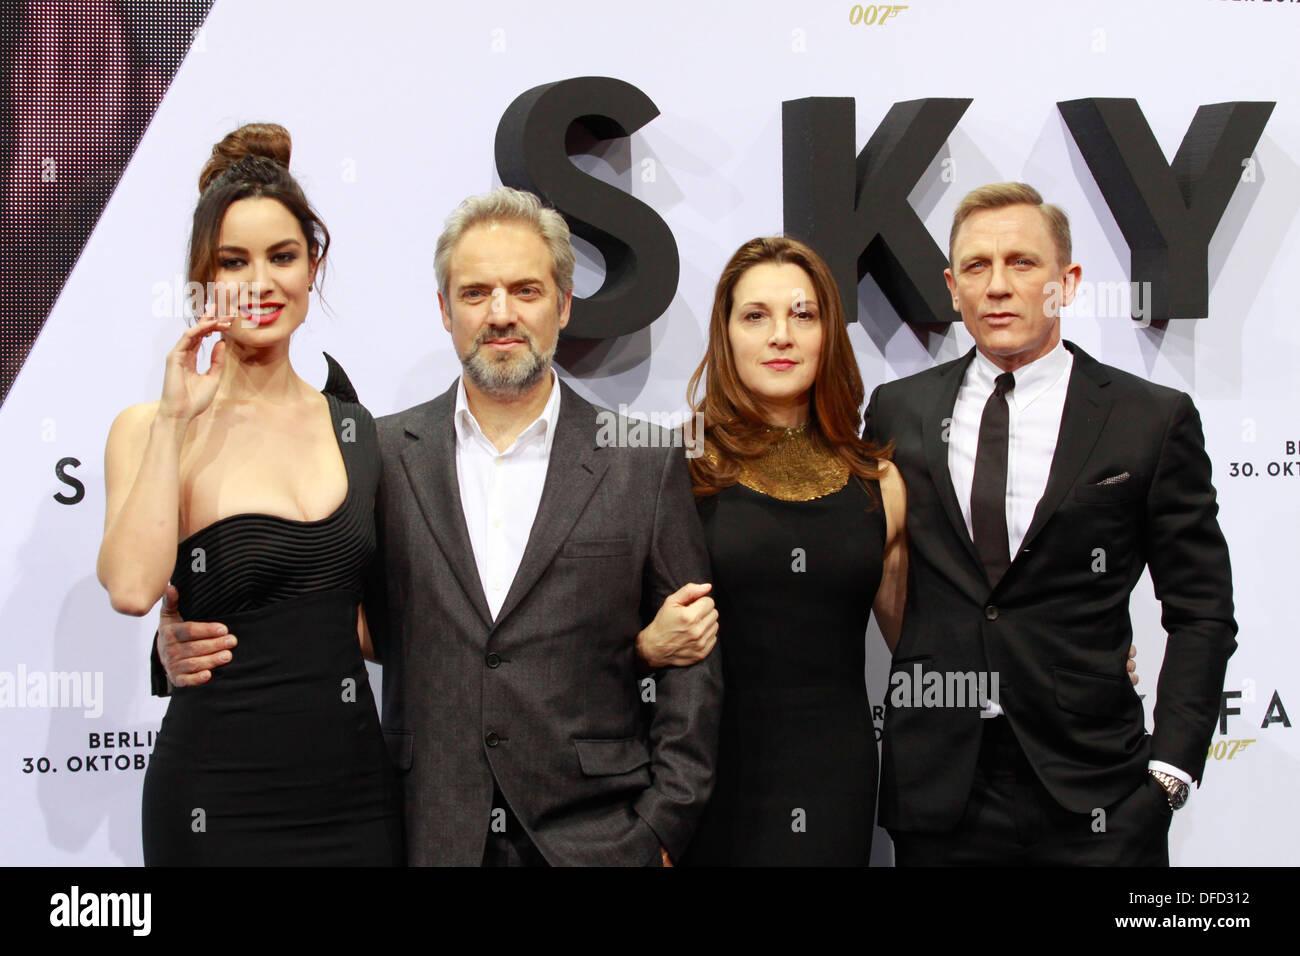 "Berenice Marlohe, Sam Mendes, Barbara Broccoli und Daniel Craig im Film ""Skyfall""-Premiere in Berlin am 30. Oktober 2012 Stockbild"